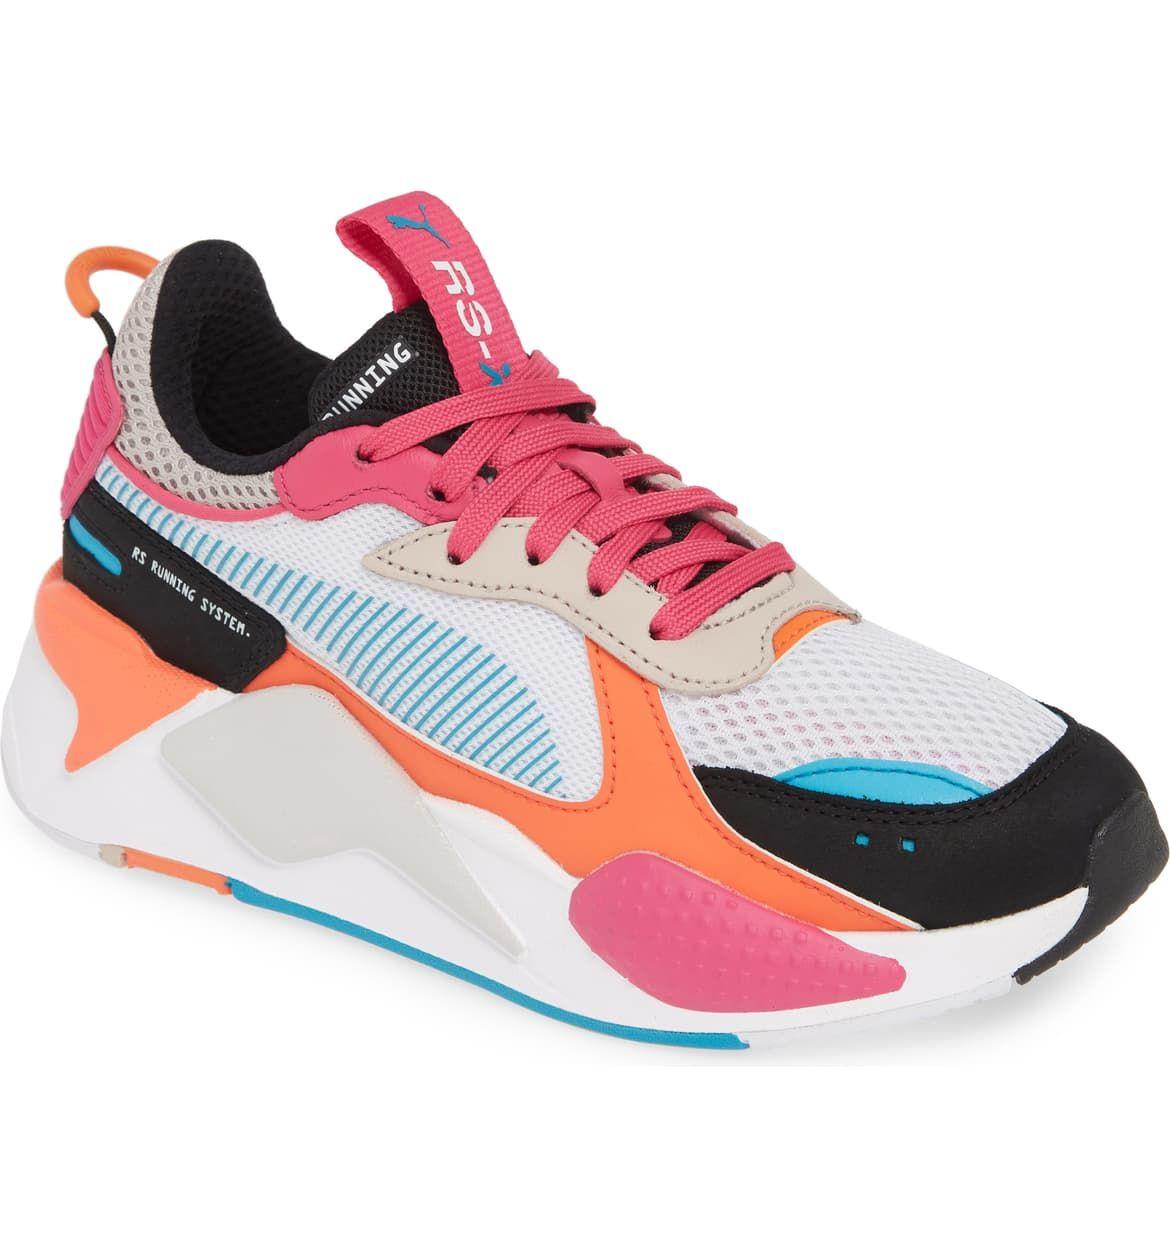 PUMA RS-X Reinvention Sneaker (Women